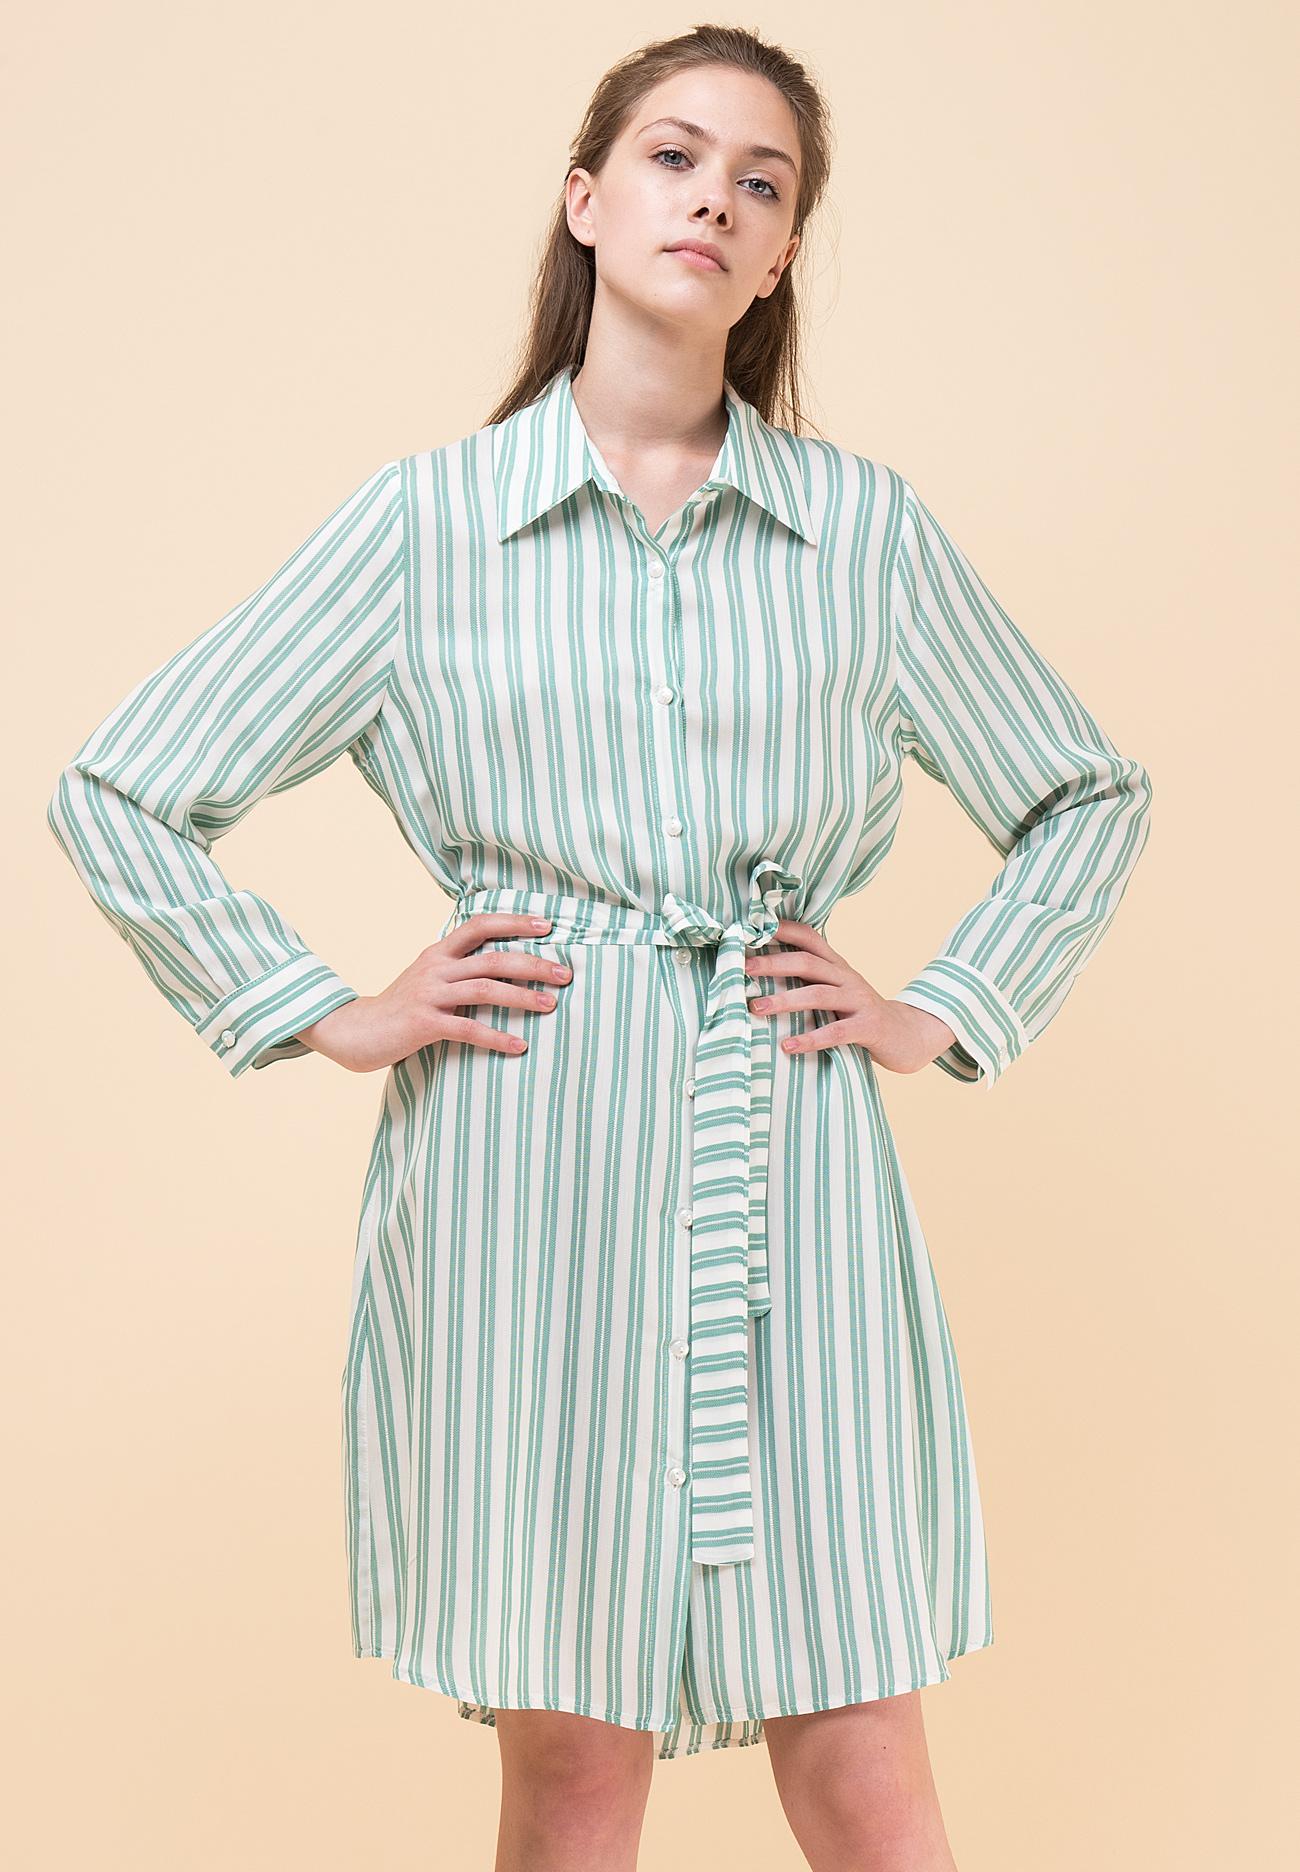 ae22636862f Ριγέ shirt φόρεμα - ZIC ZAC